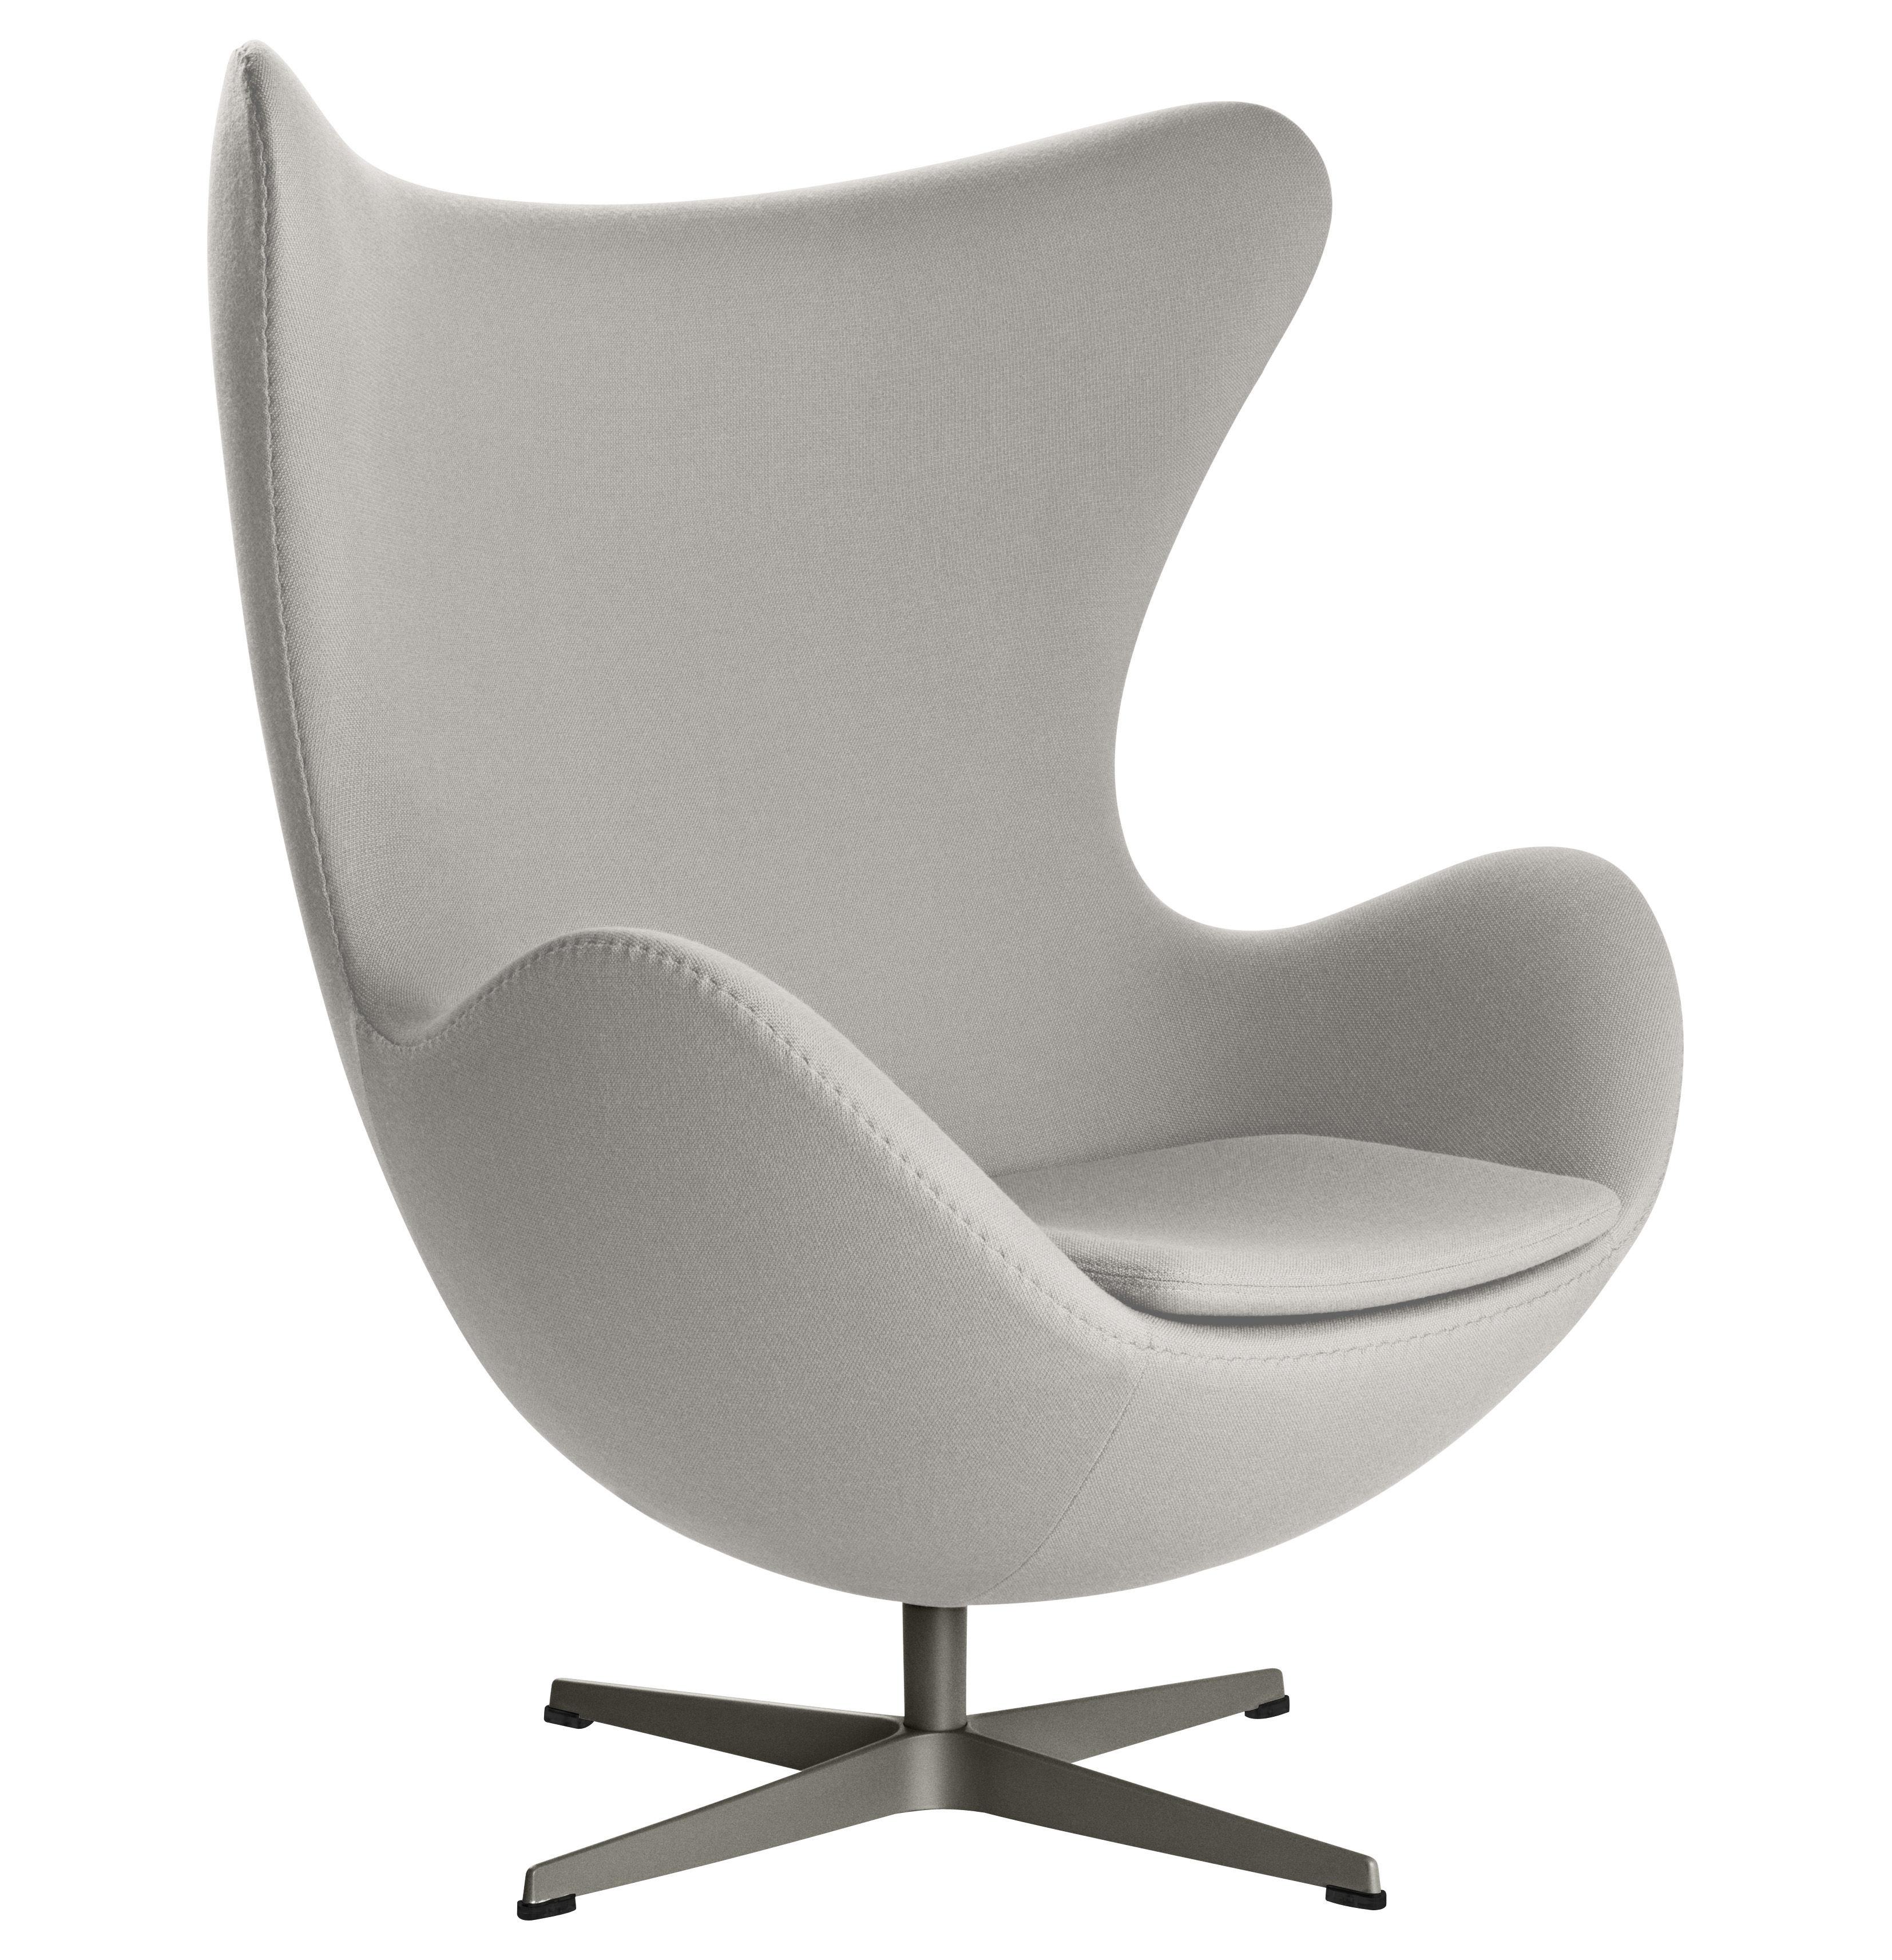 egg chair swivel armchair gabriele fame fabric light grey by fritz hansen. Black Bedroom Furniture Sets. Home Design Ideas